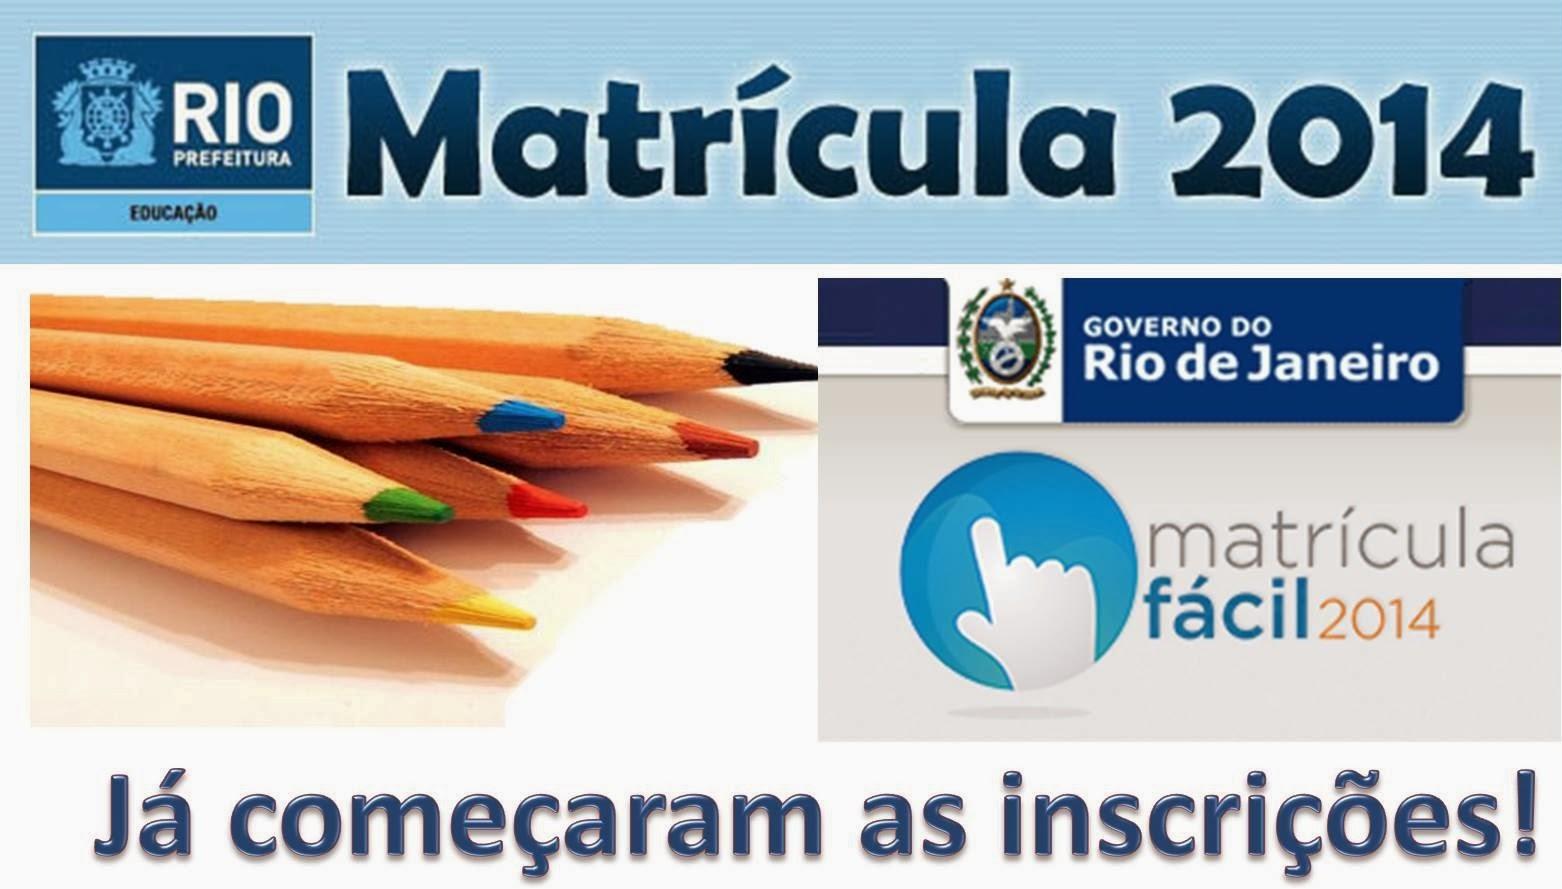 2 FASE DO MATRÍCULA FÁCIL 2014 RJ - SE INSCREVA